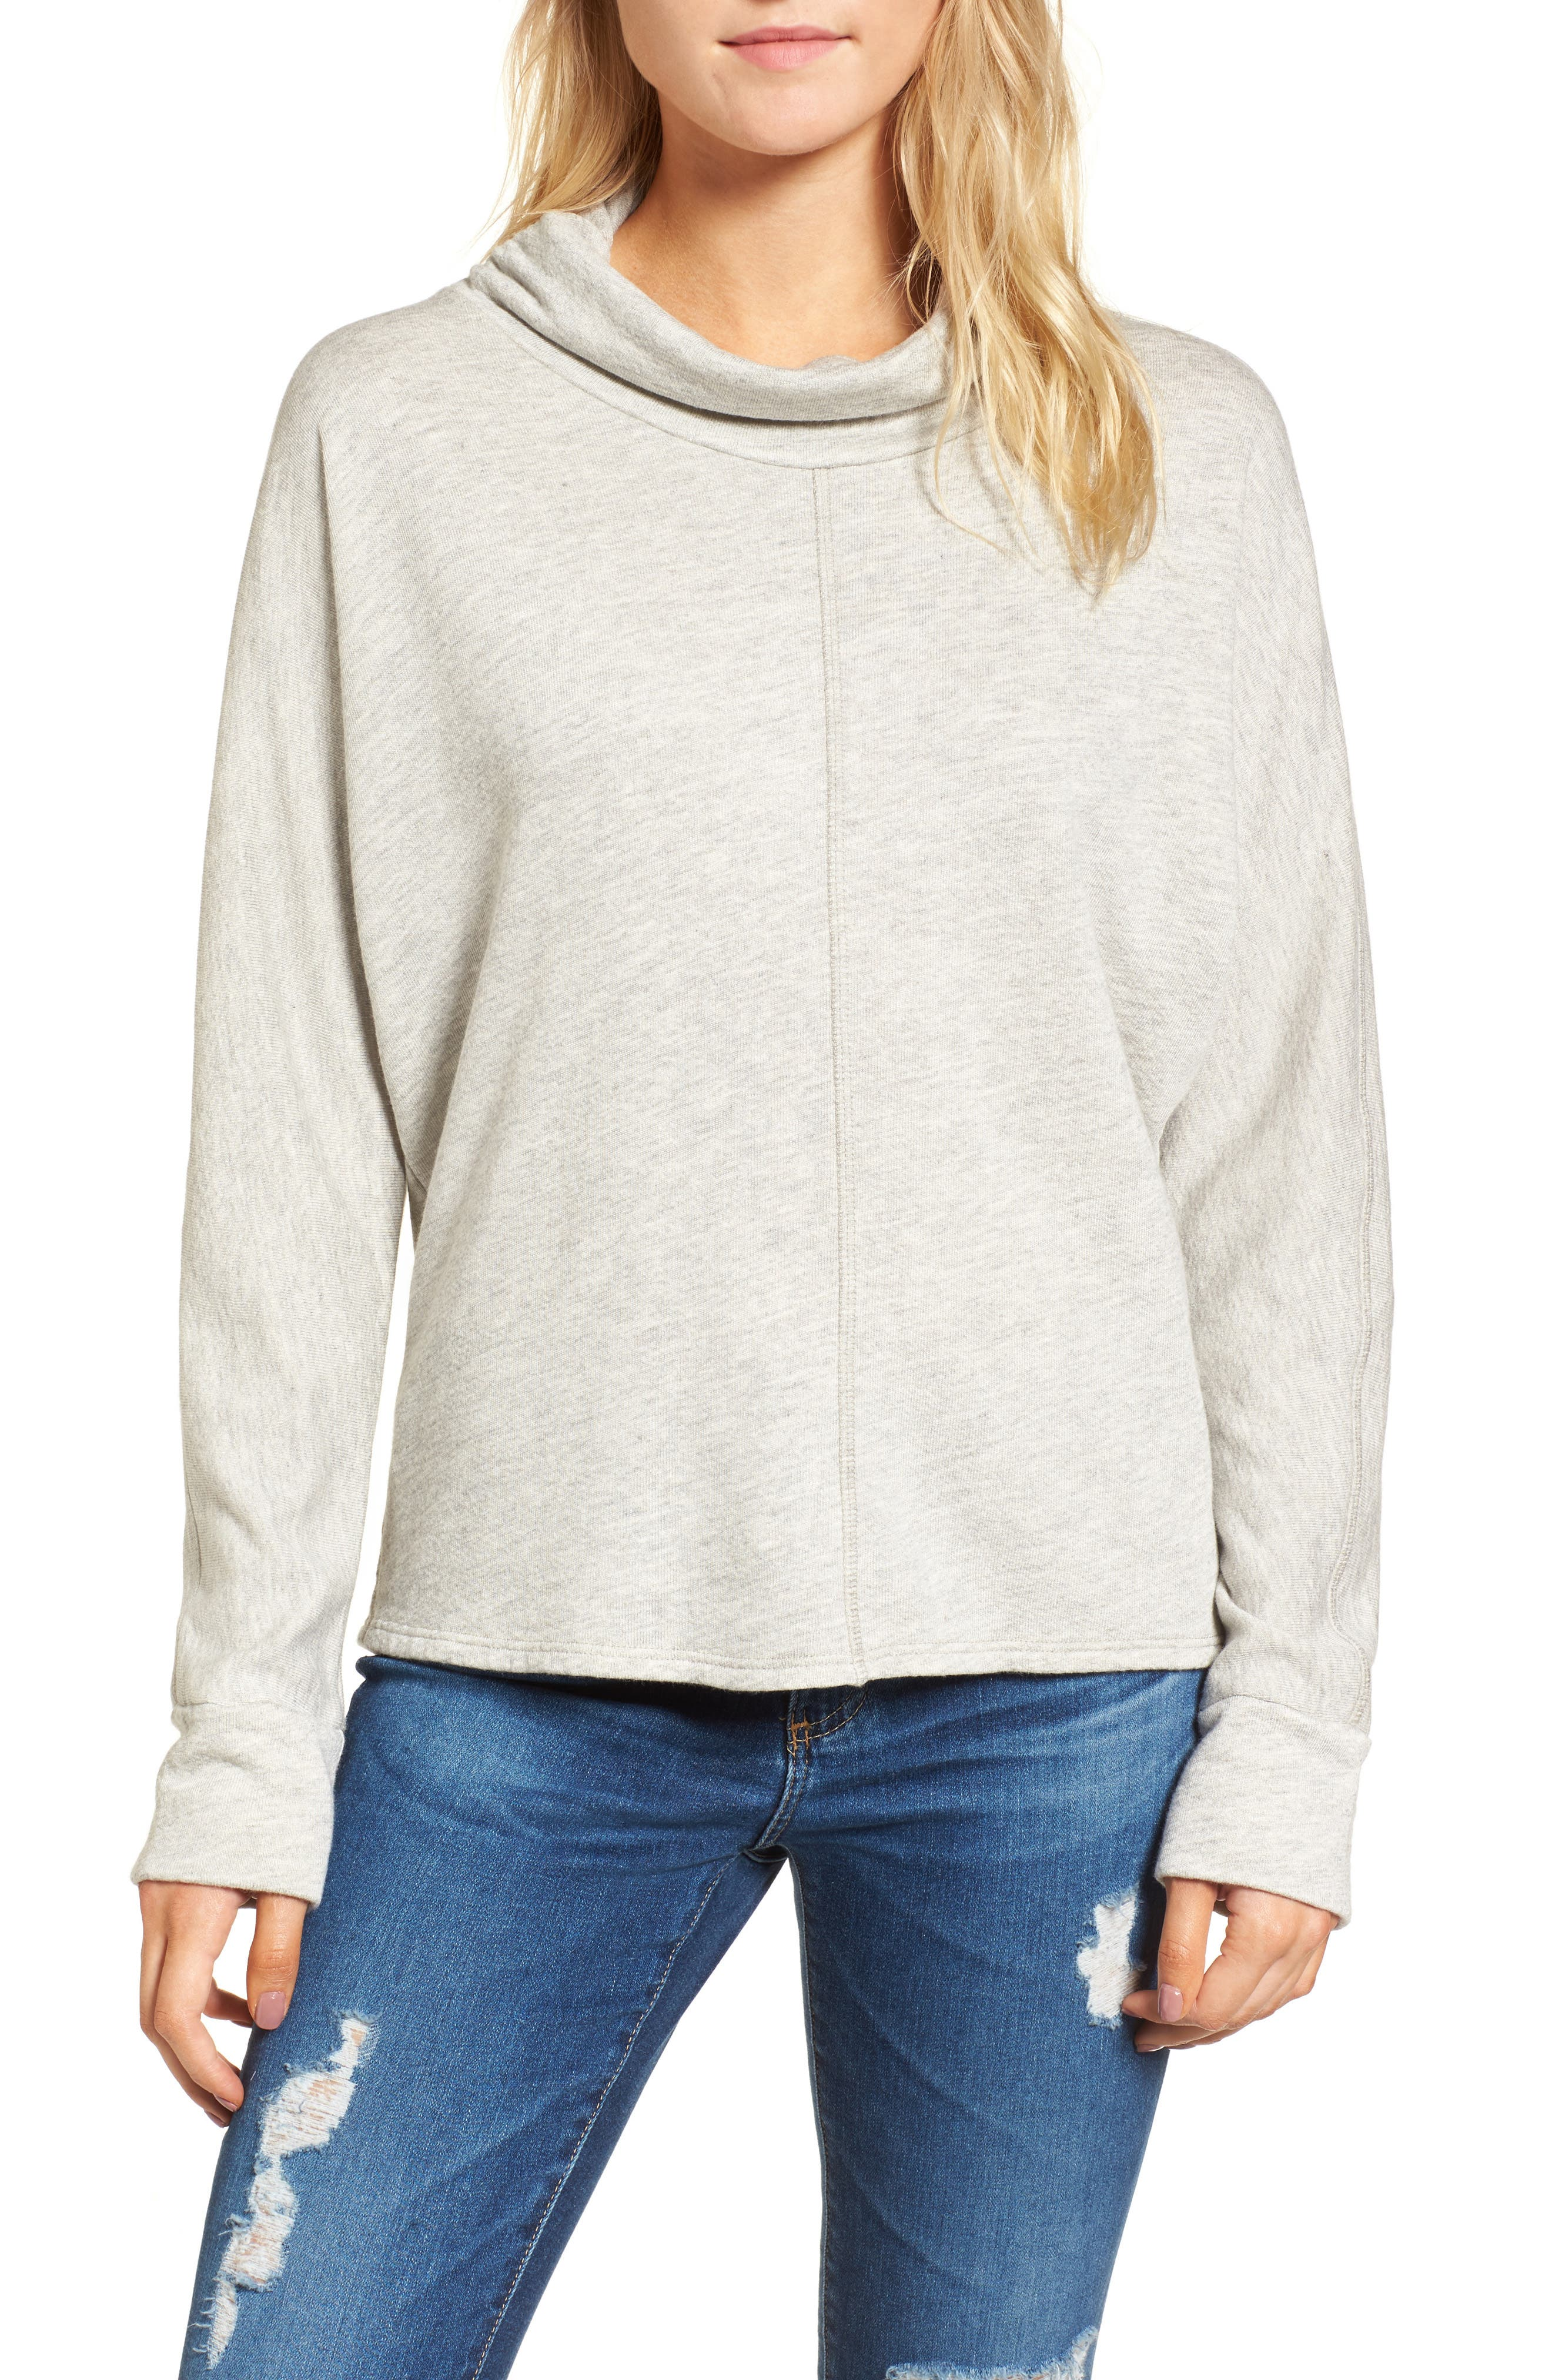 n:PHILANTHROPY Helix Turtleneck Sweatshirt